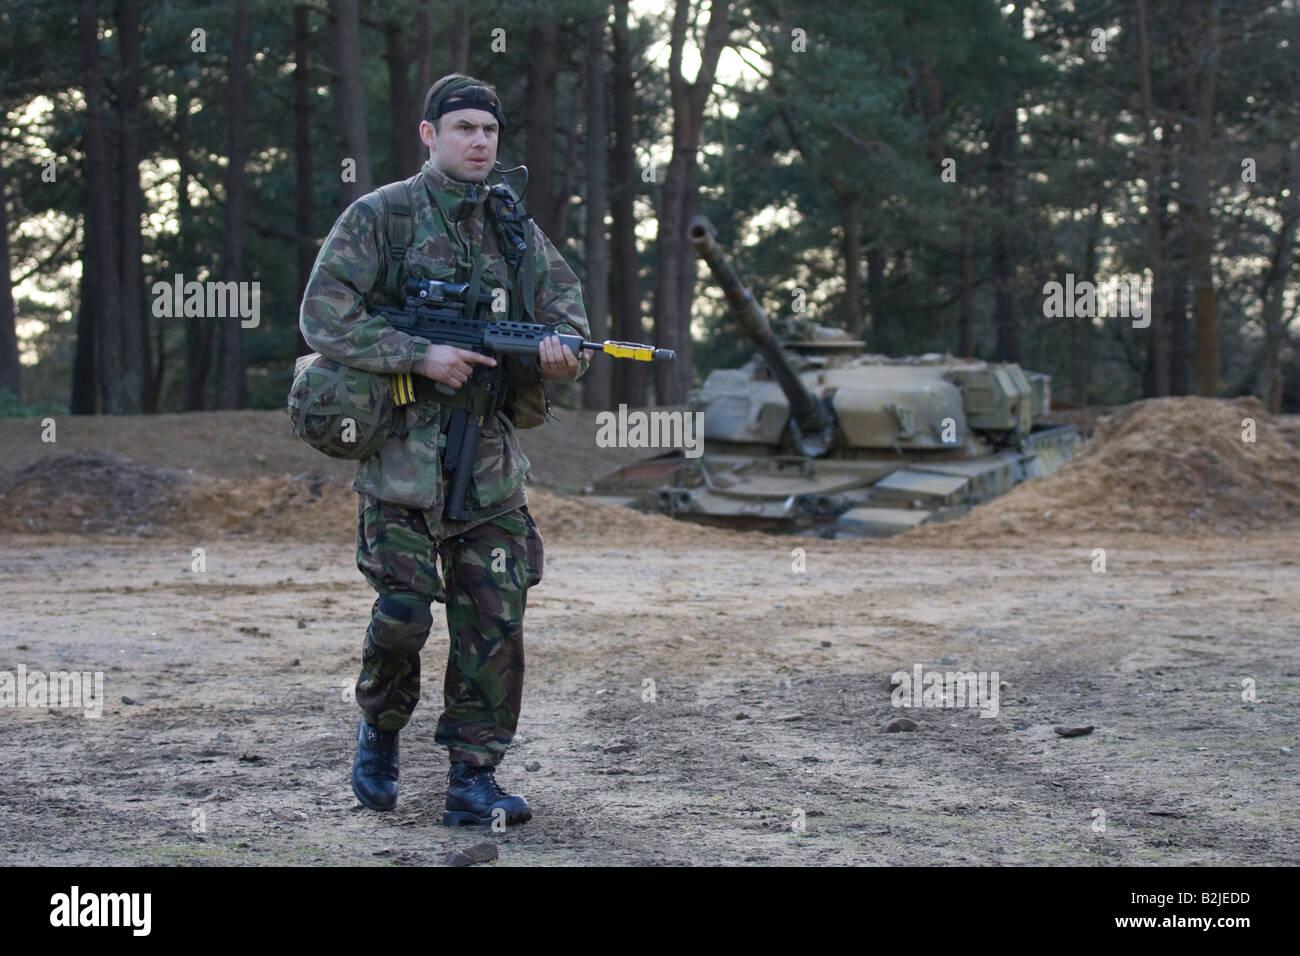 RAF Regiment recruit on training excercise - Stock Image